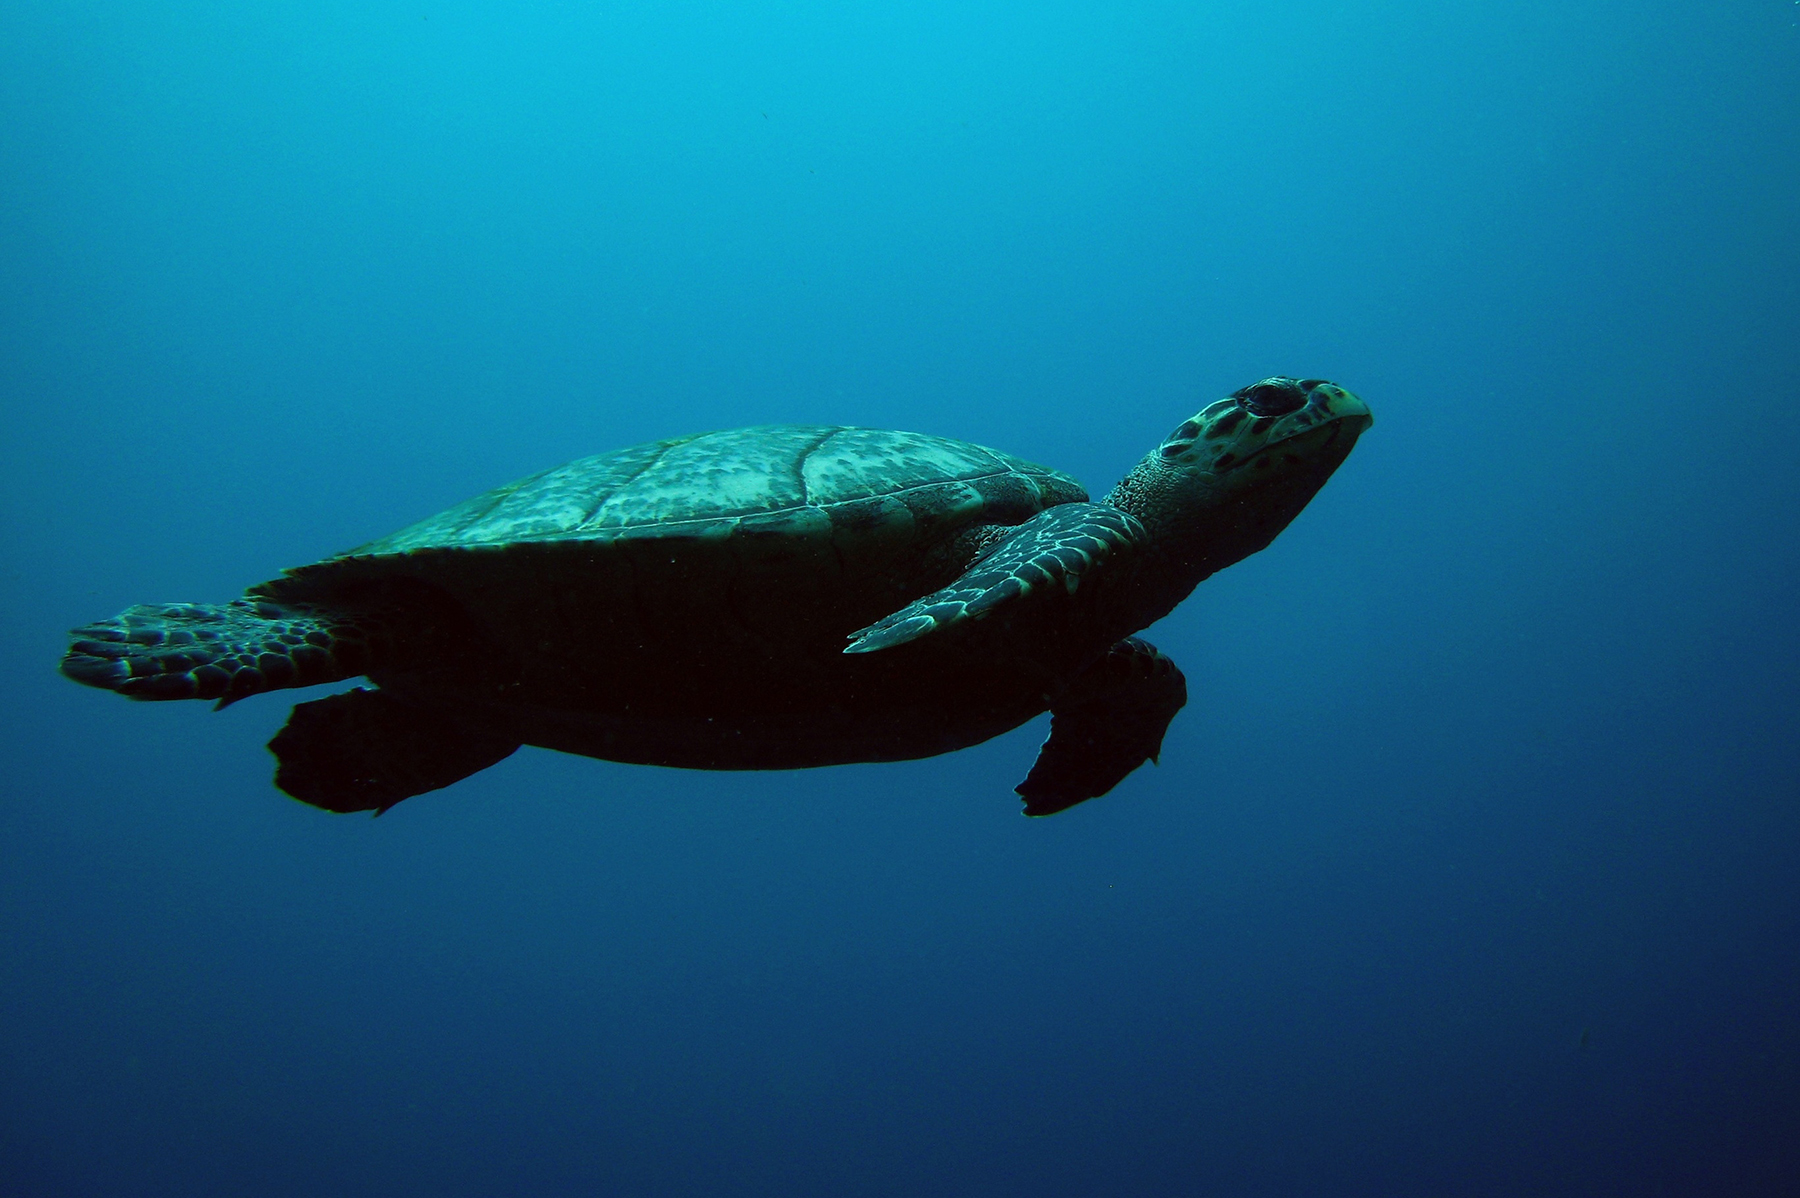 hawksbill turtle swimming underwater